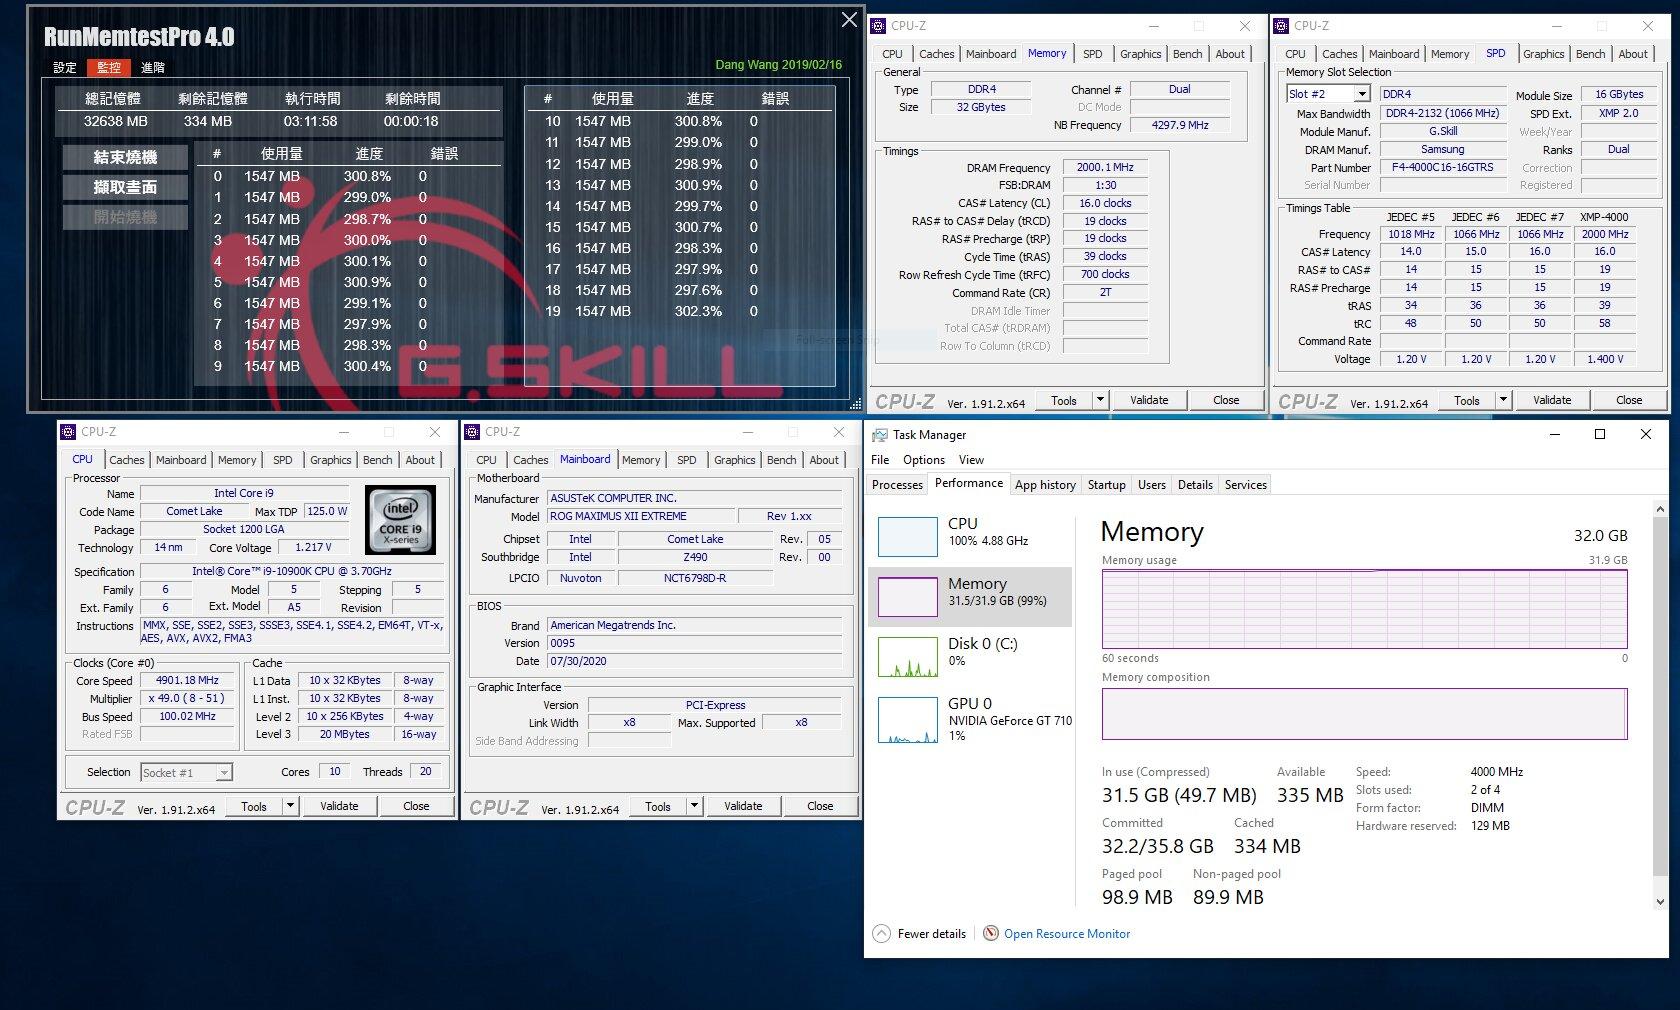 G.Skill Trident Z Royal, Trident Z RGB und Ripjaws V als 32-GB-Kit mit 4.000 MHz bei CL16 (Asus Z490)